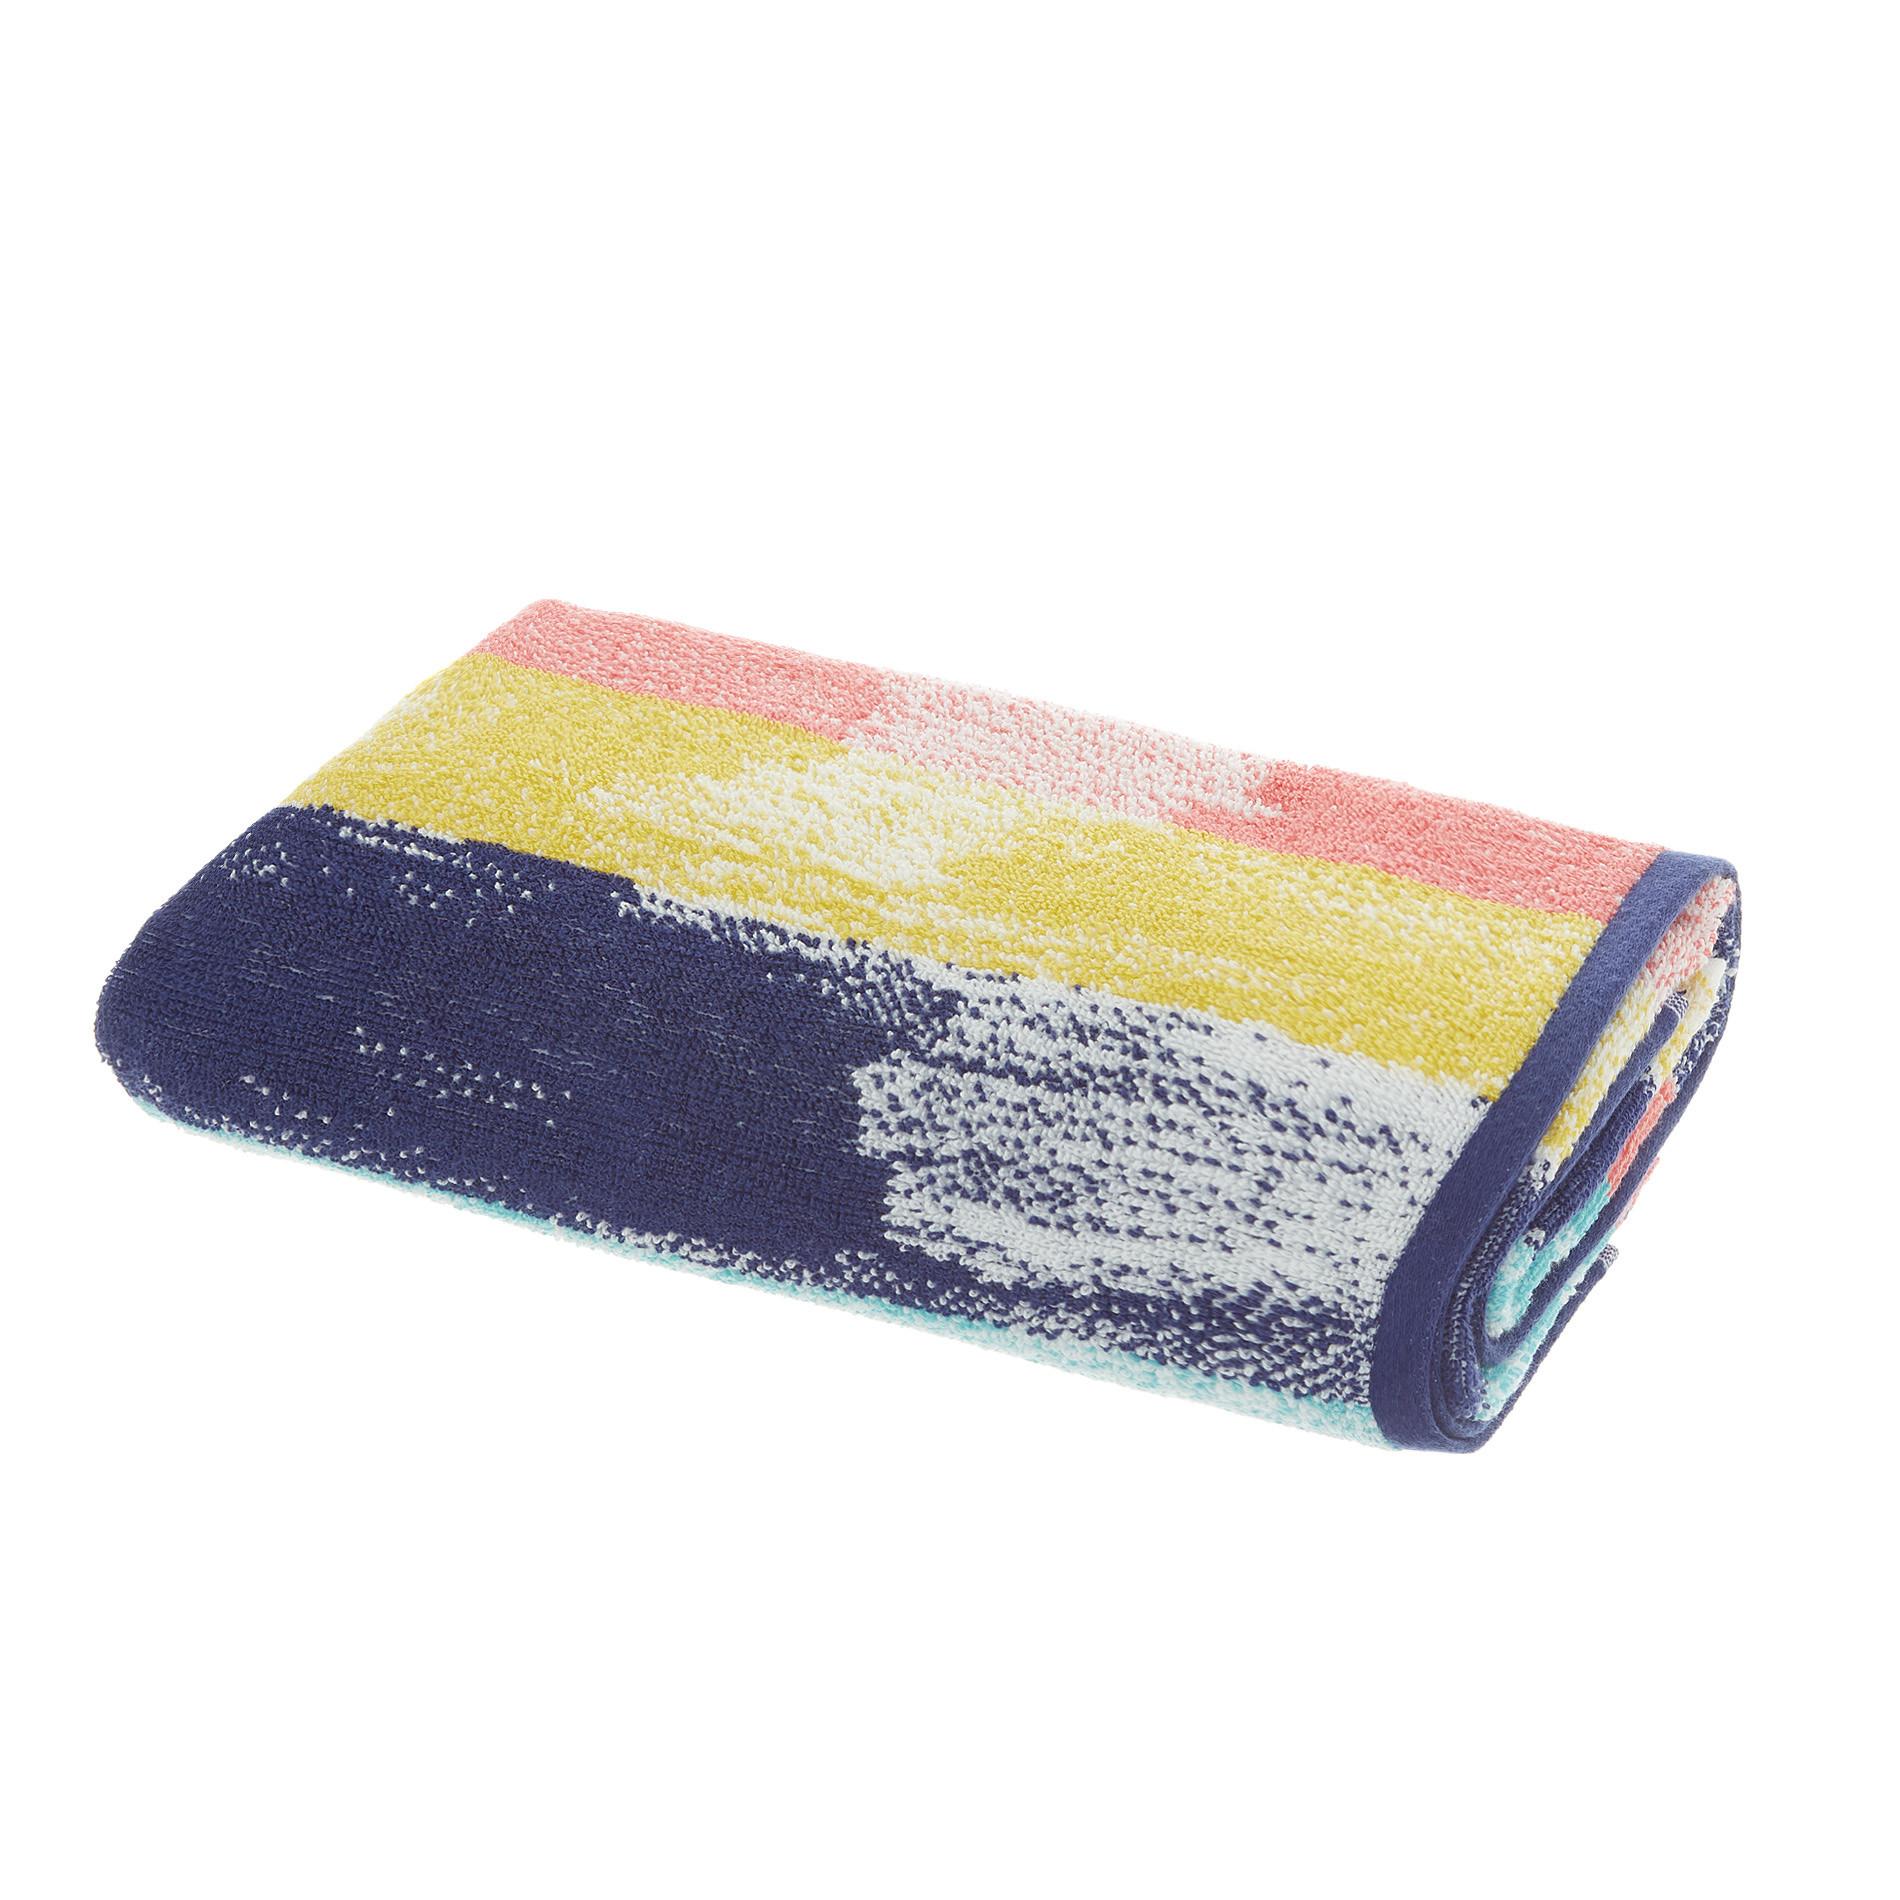 Asciugamano spugna di cotone fantasia pennellate, Multicolor, large image number 1